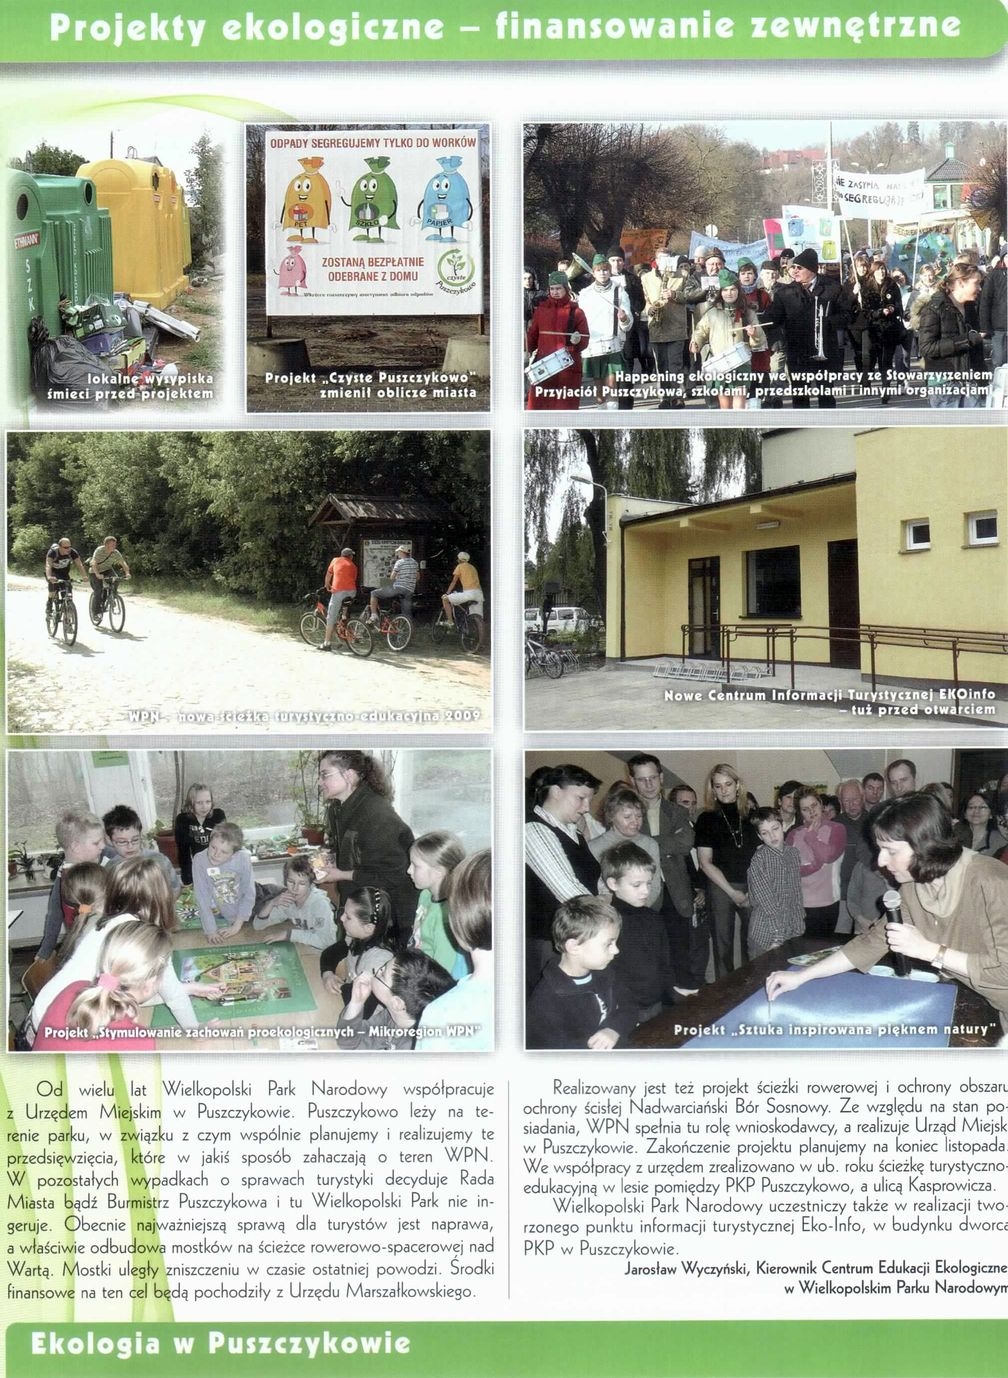 9_projekty ekologiczne1